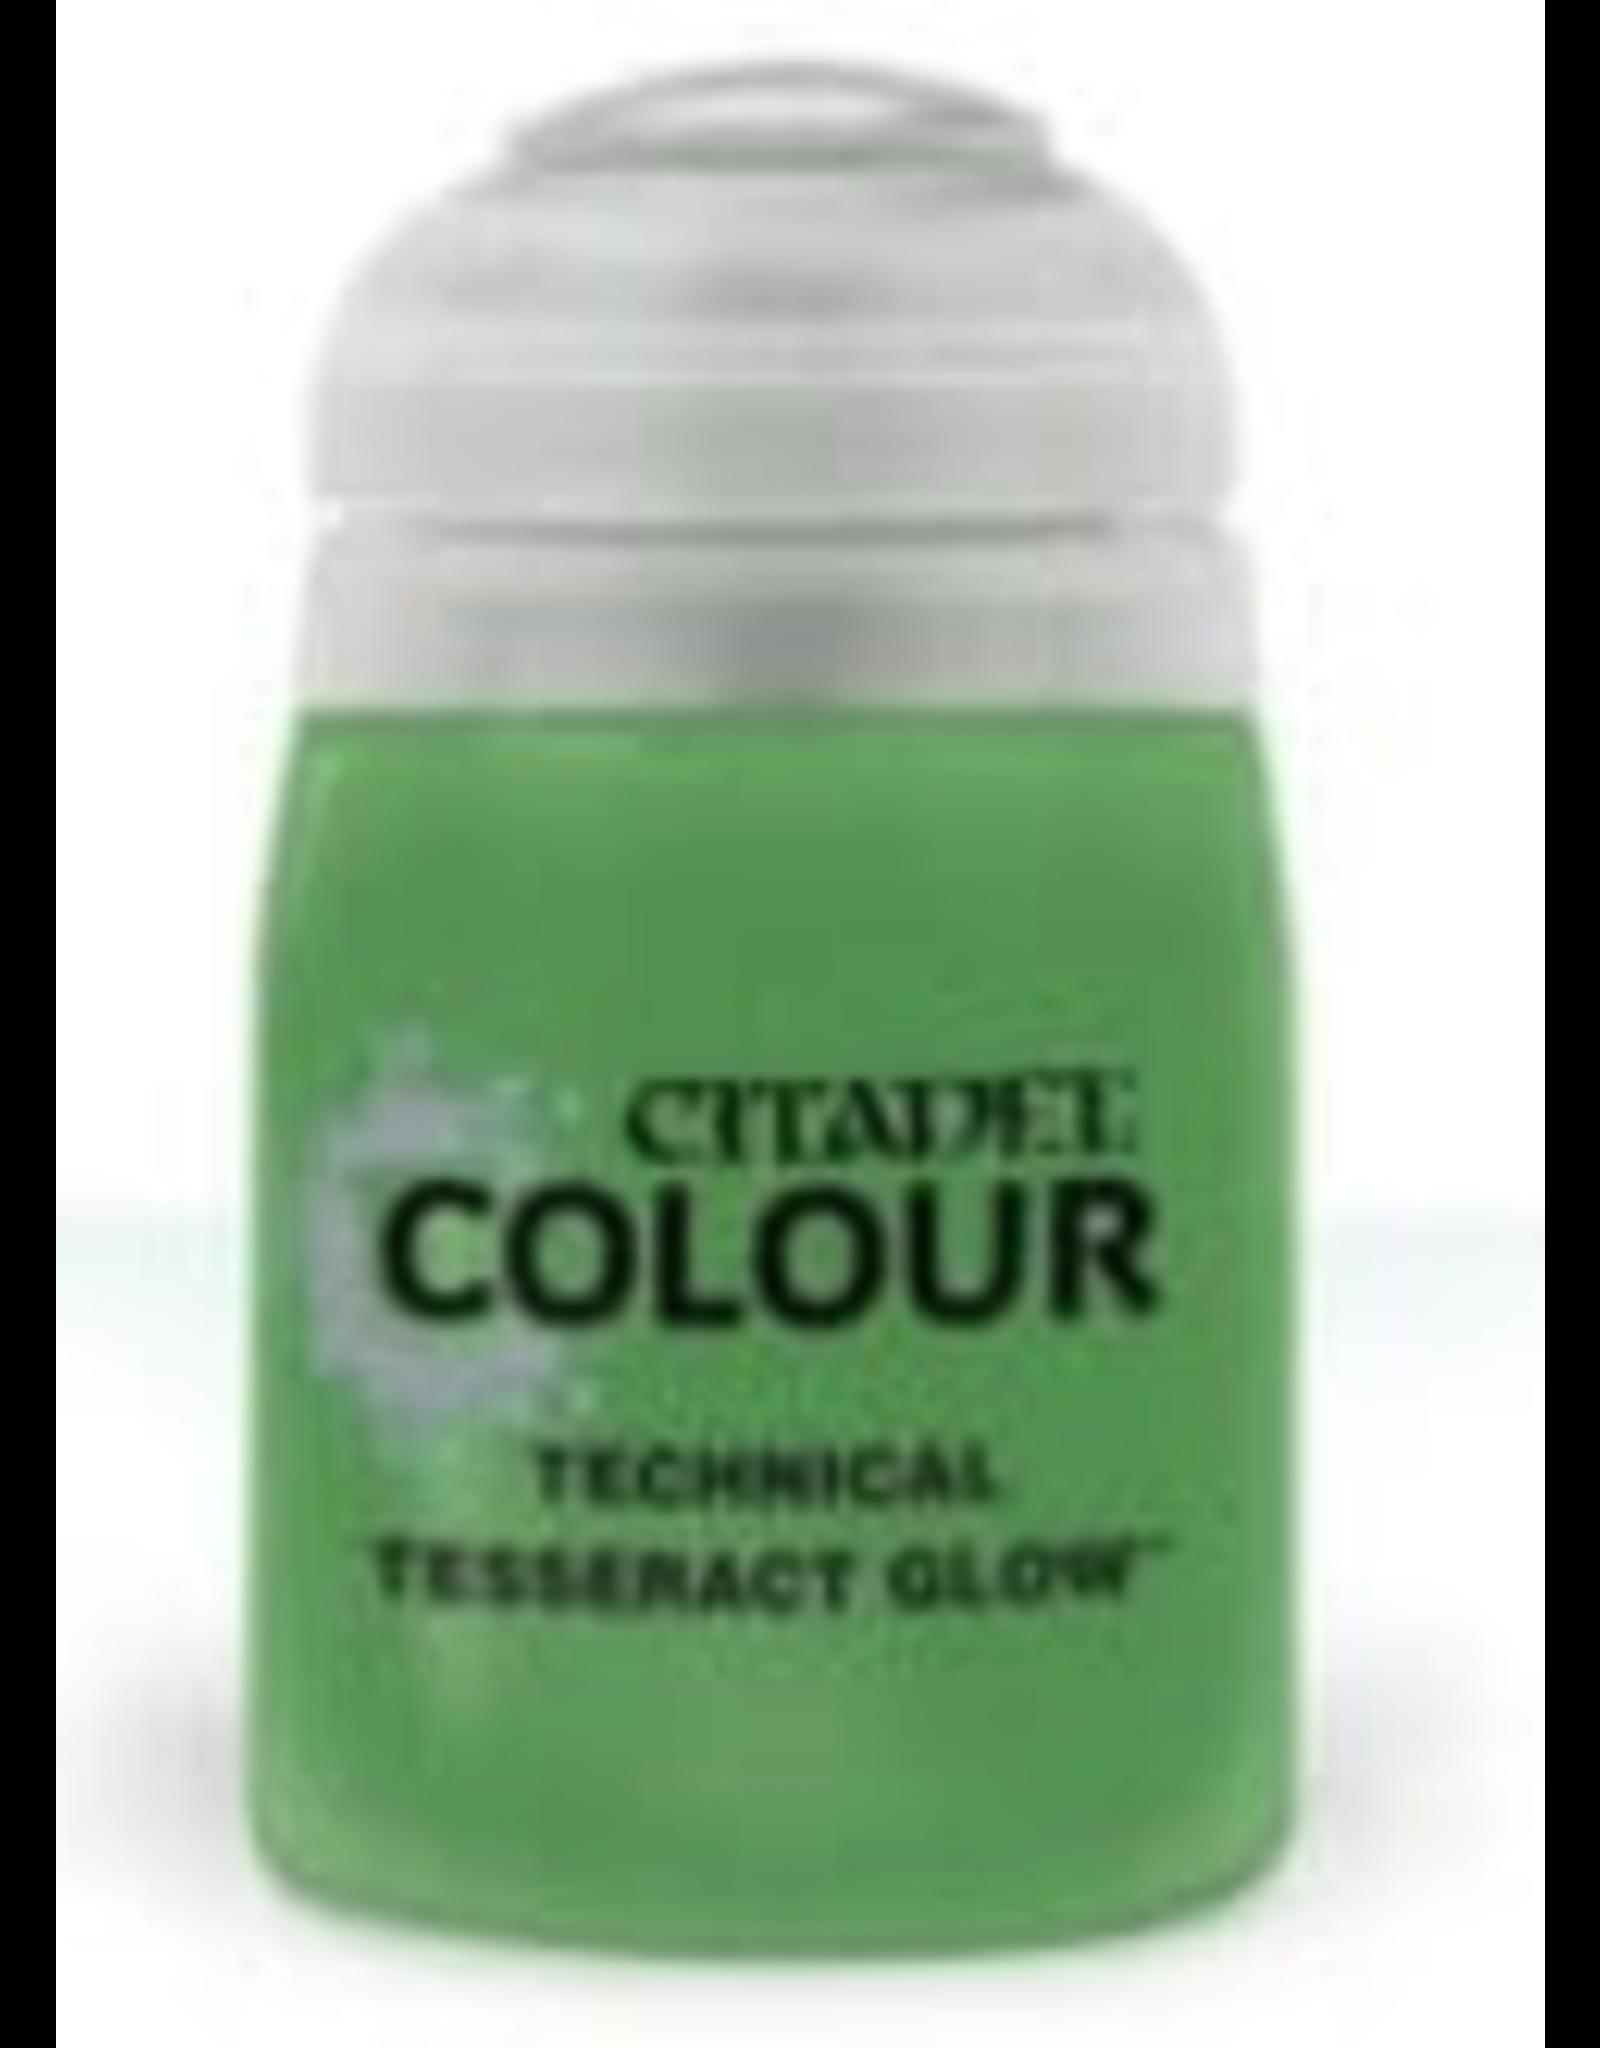 Citadel Citadel Paints: Technical - Tesseract Glow (18Ml)